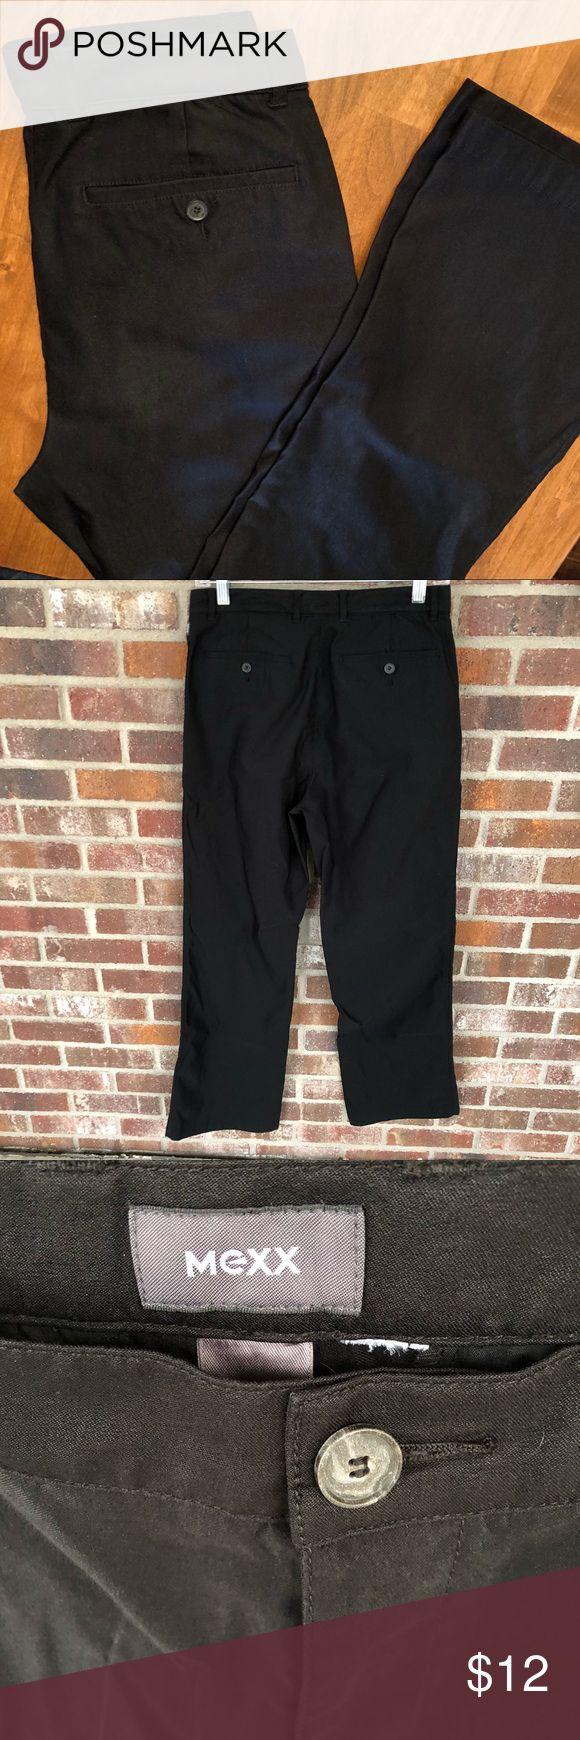 Mexx brand men's fashion pants Vintage men's black fashion pants circa 1990's. Flare leg. Synthetic material and sheen. Mexx Pants Dress